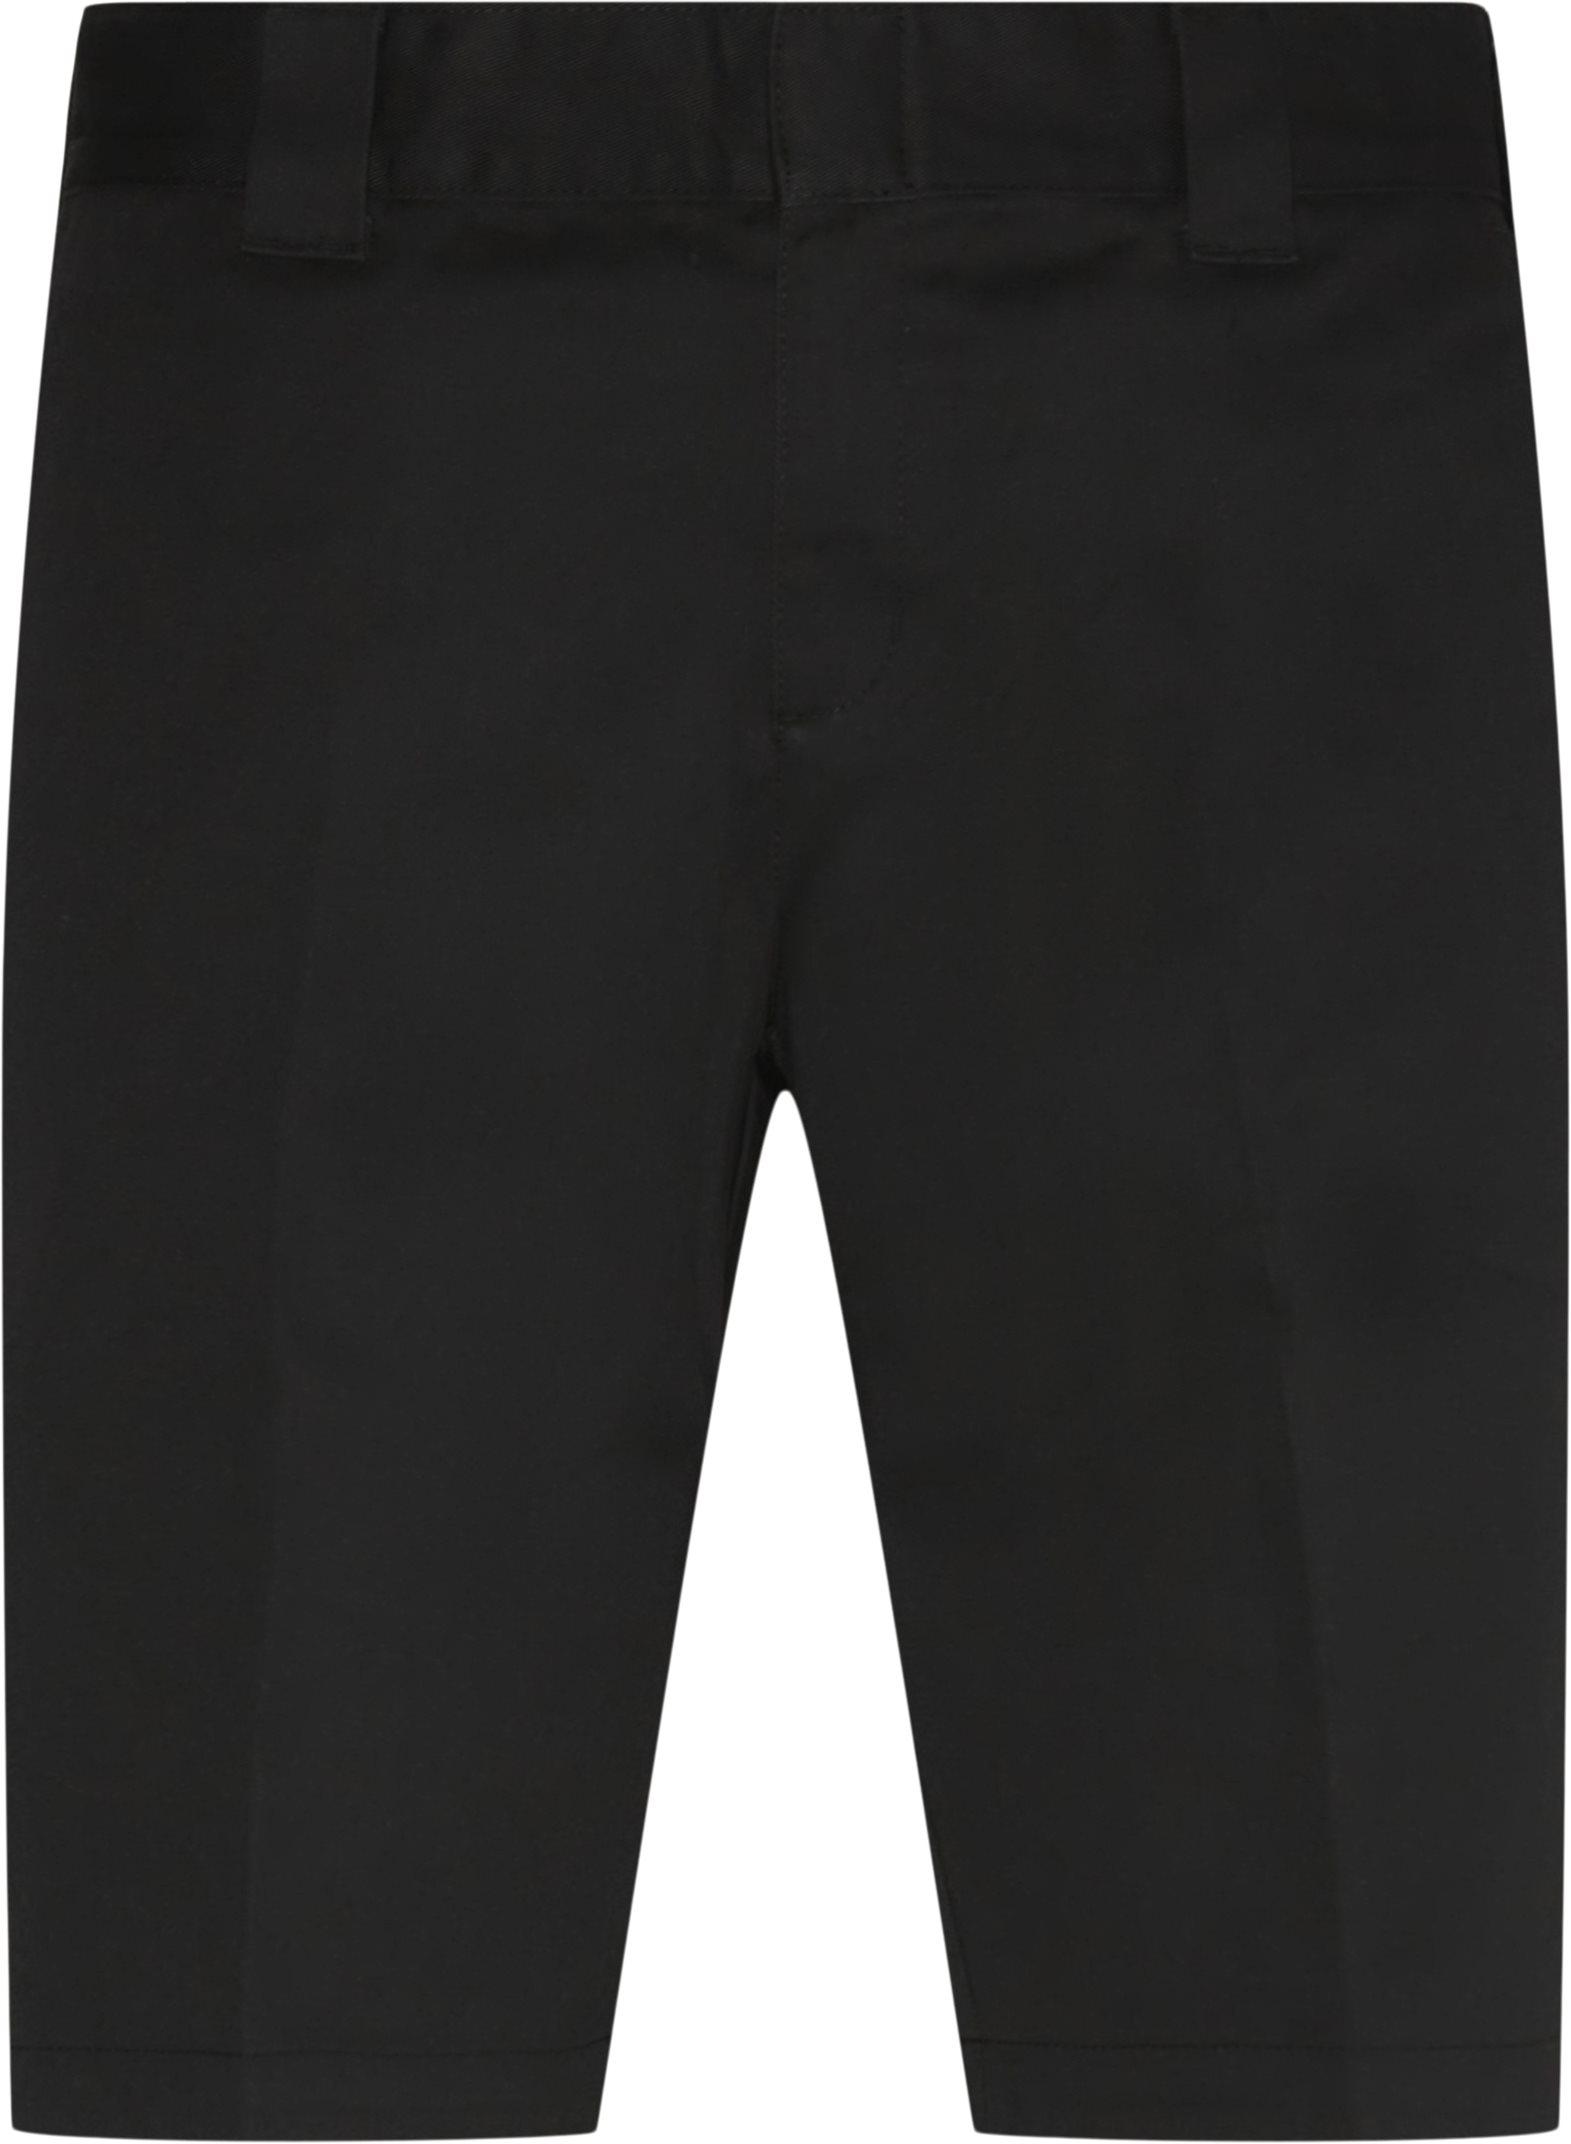 Slim Fit Shorts - Cargo pants - Slim - Sort